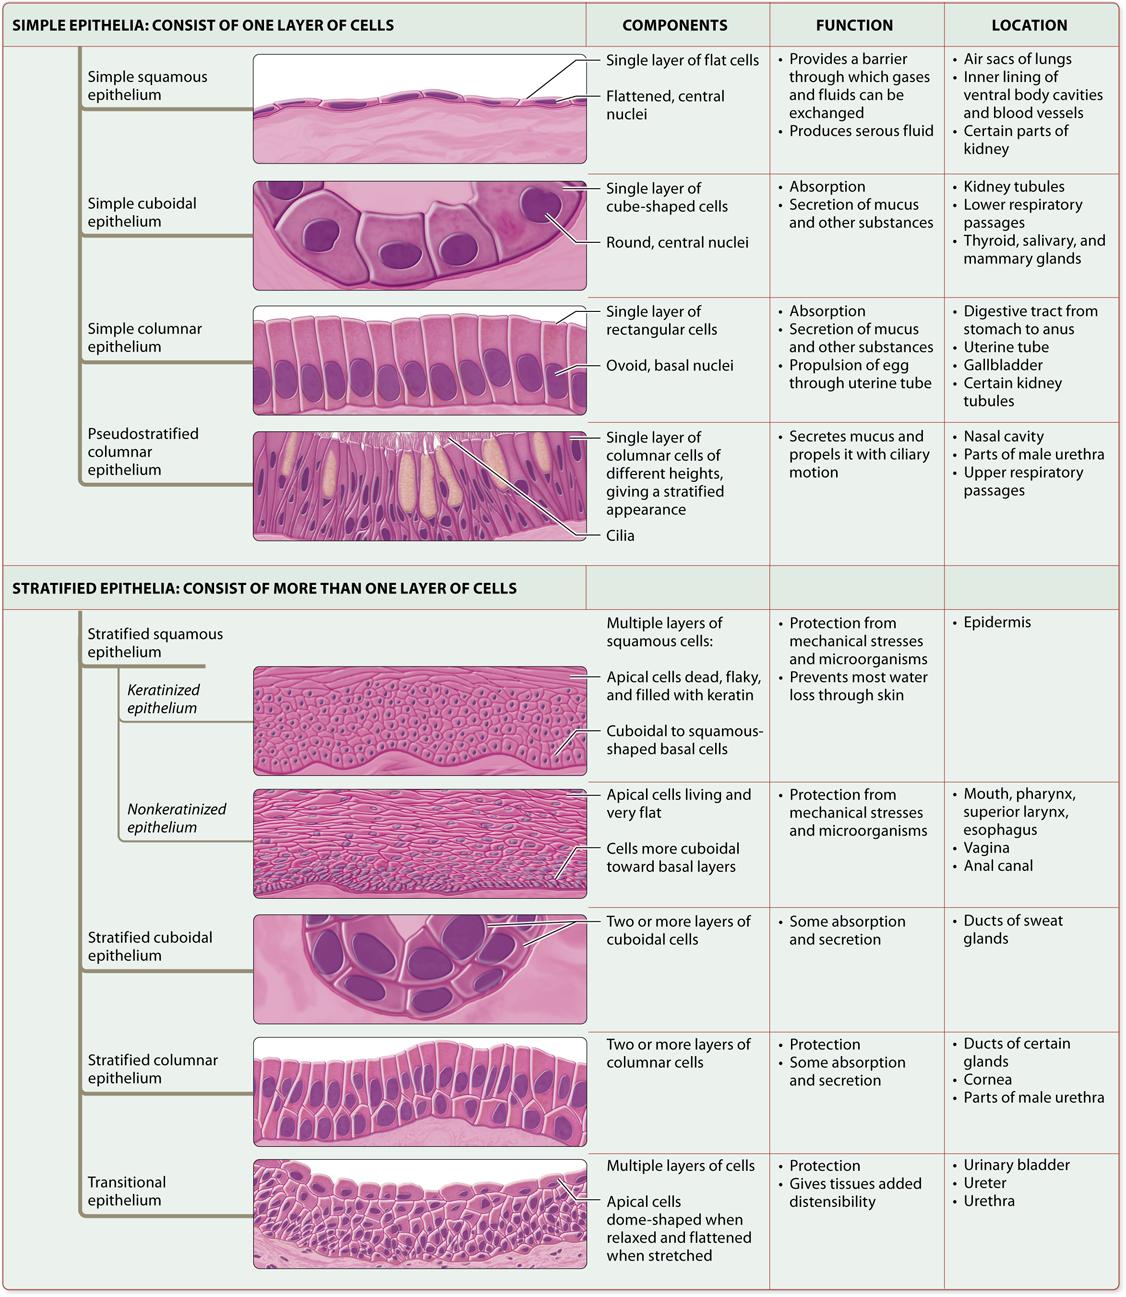 Module 4 2 Epithelial Tissues